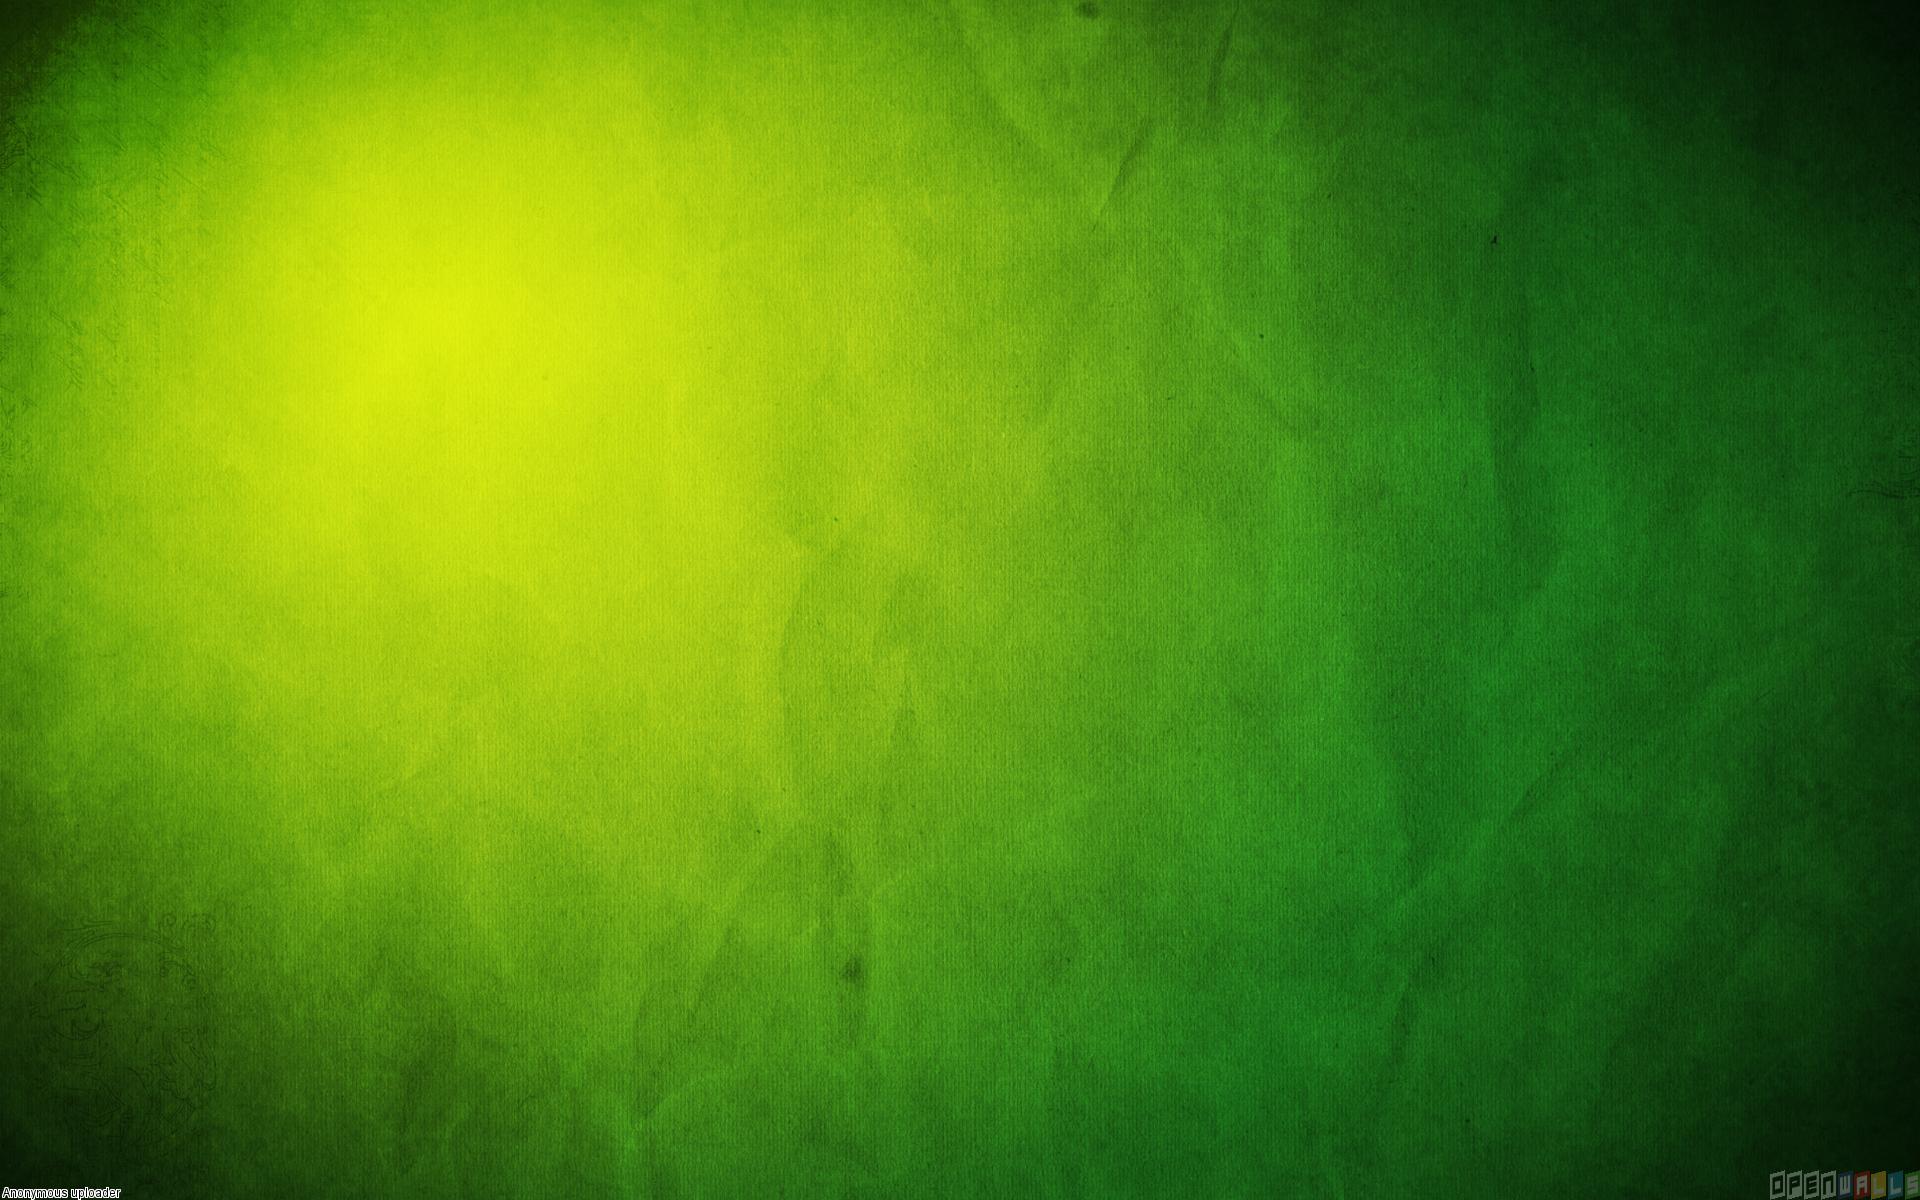 Green background wallpaper 11705   Open Walls 1920x1200